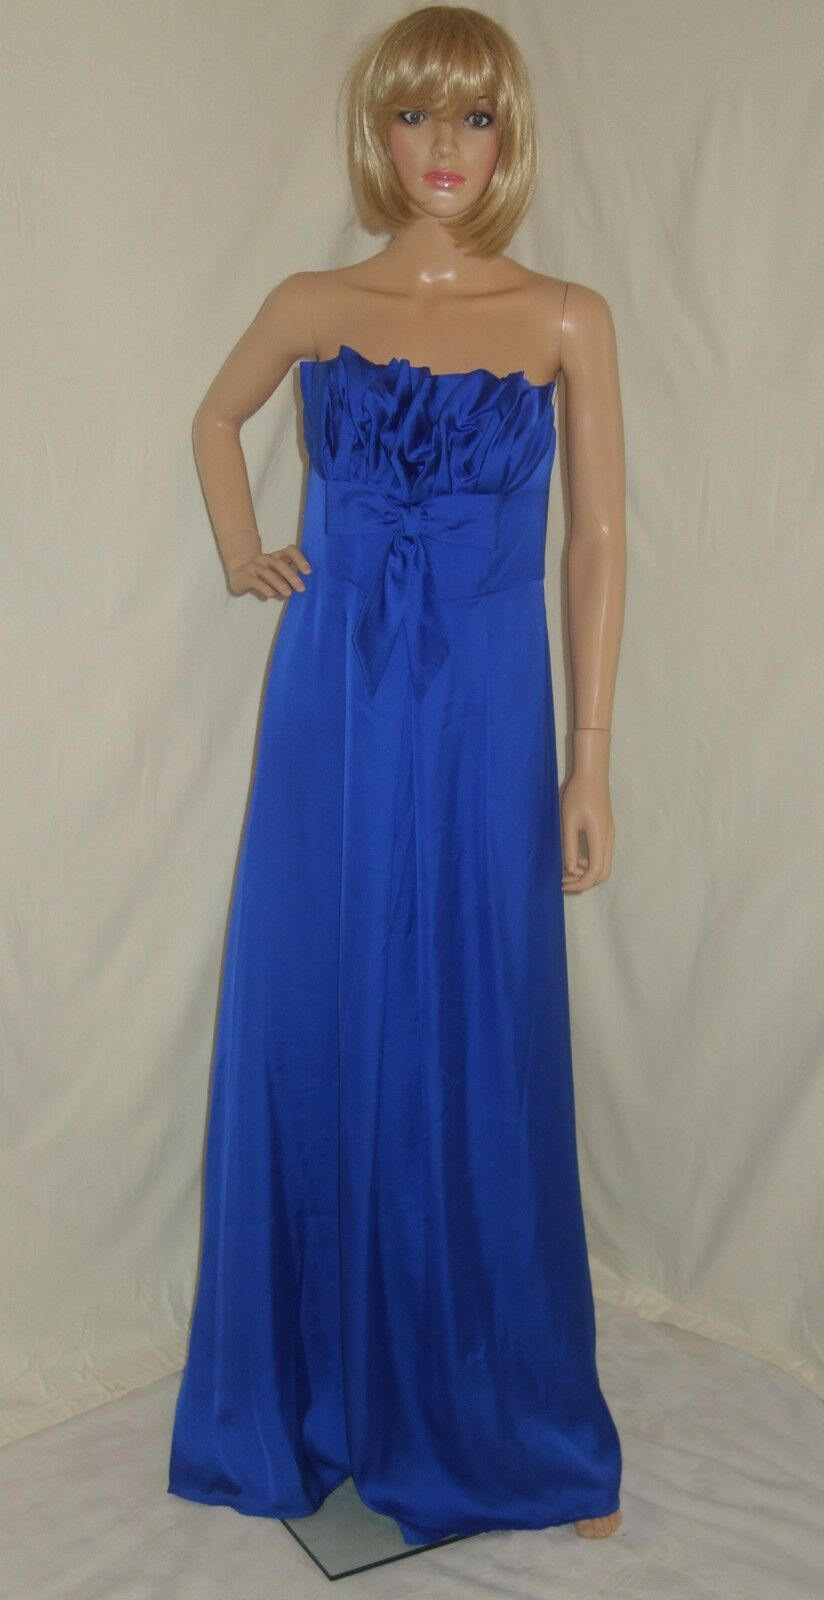 Elfe by Elif ErTurk dress Sleeveless Ruffle Ruffle Ruffle NAVY blueE SZ 42 NEW c2da1f